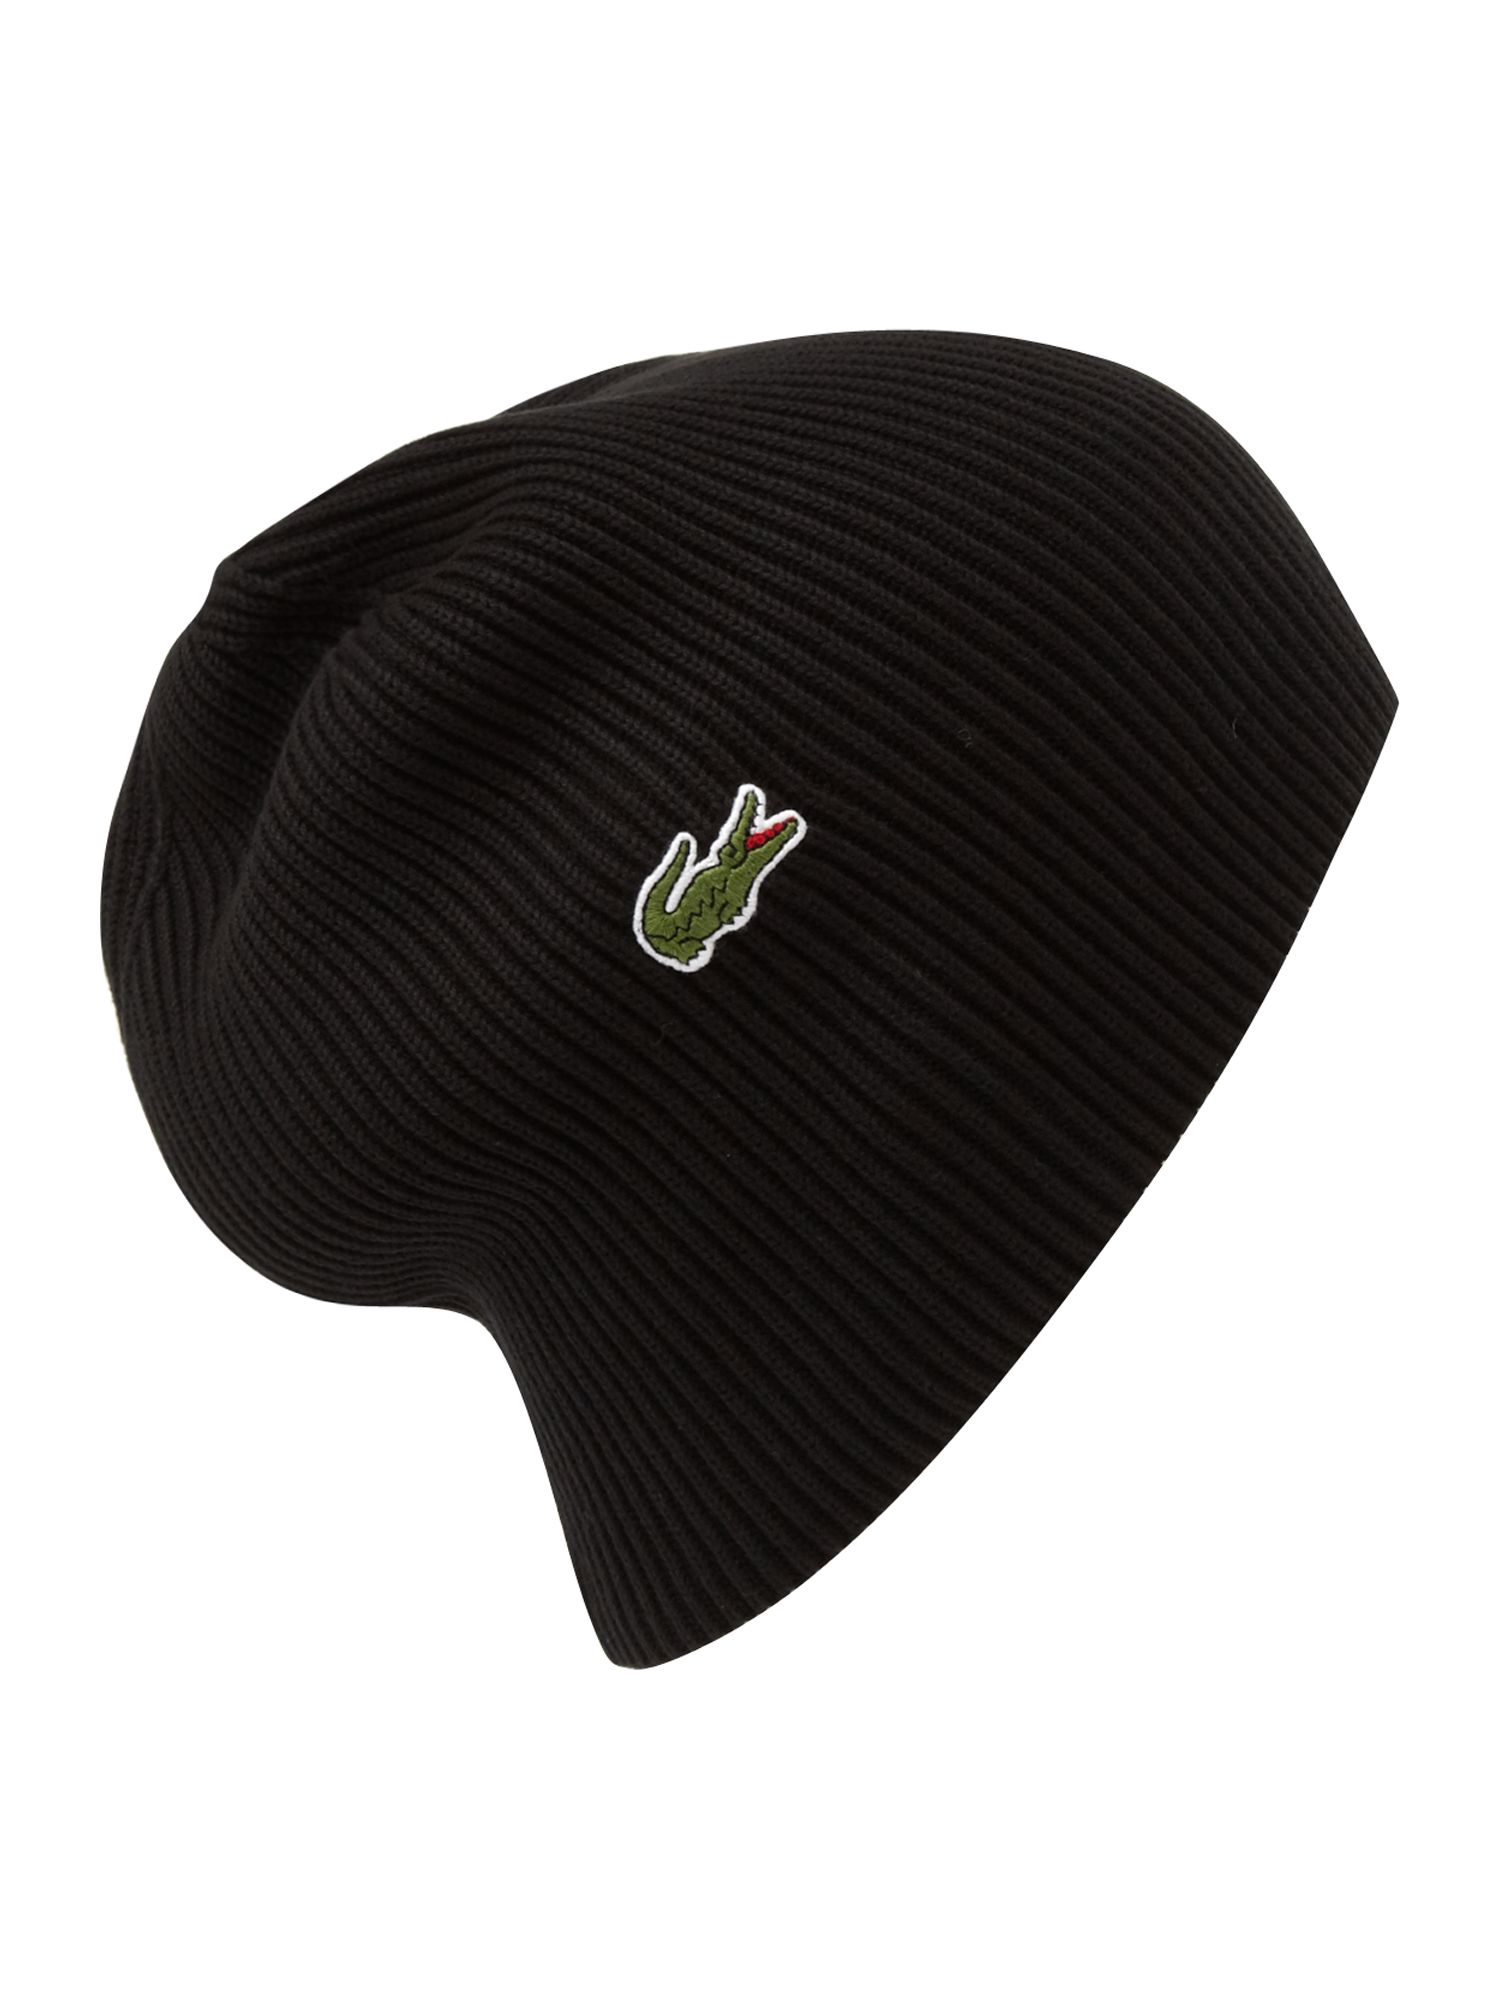 Mens Black Logo Beanie  meet a9fe2 26abc Lacoste Ribbed Beanie Hat in Black  for Men Lyst ... bcfbaed0288e